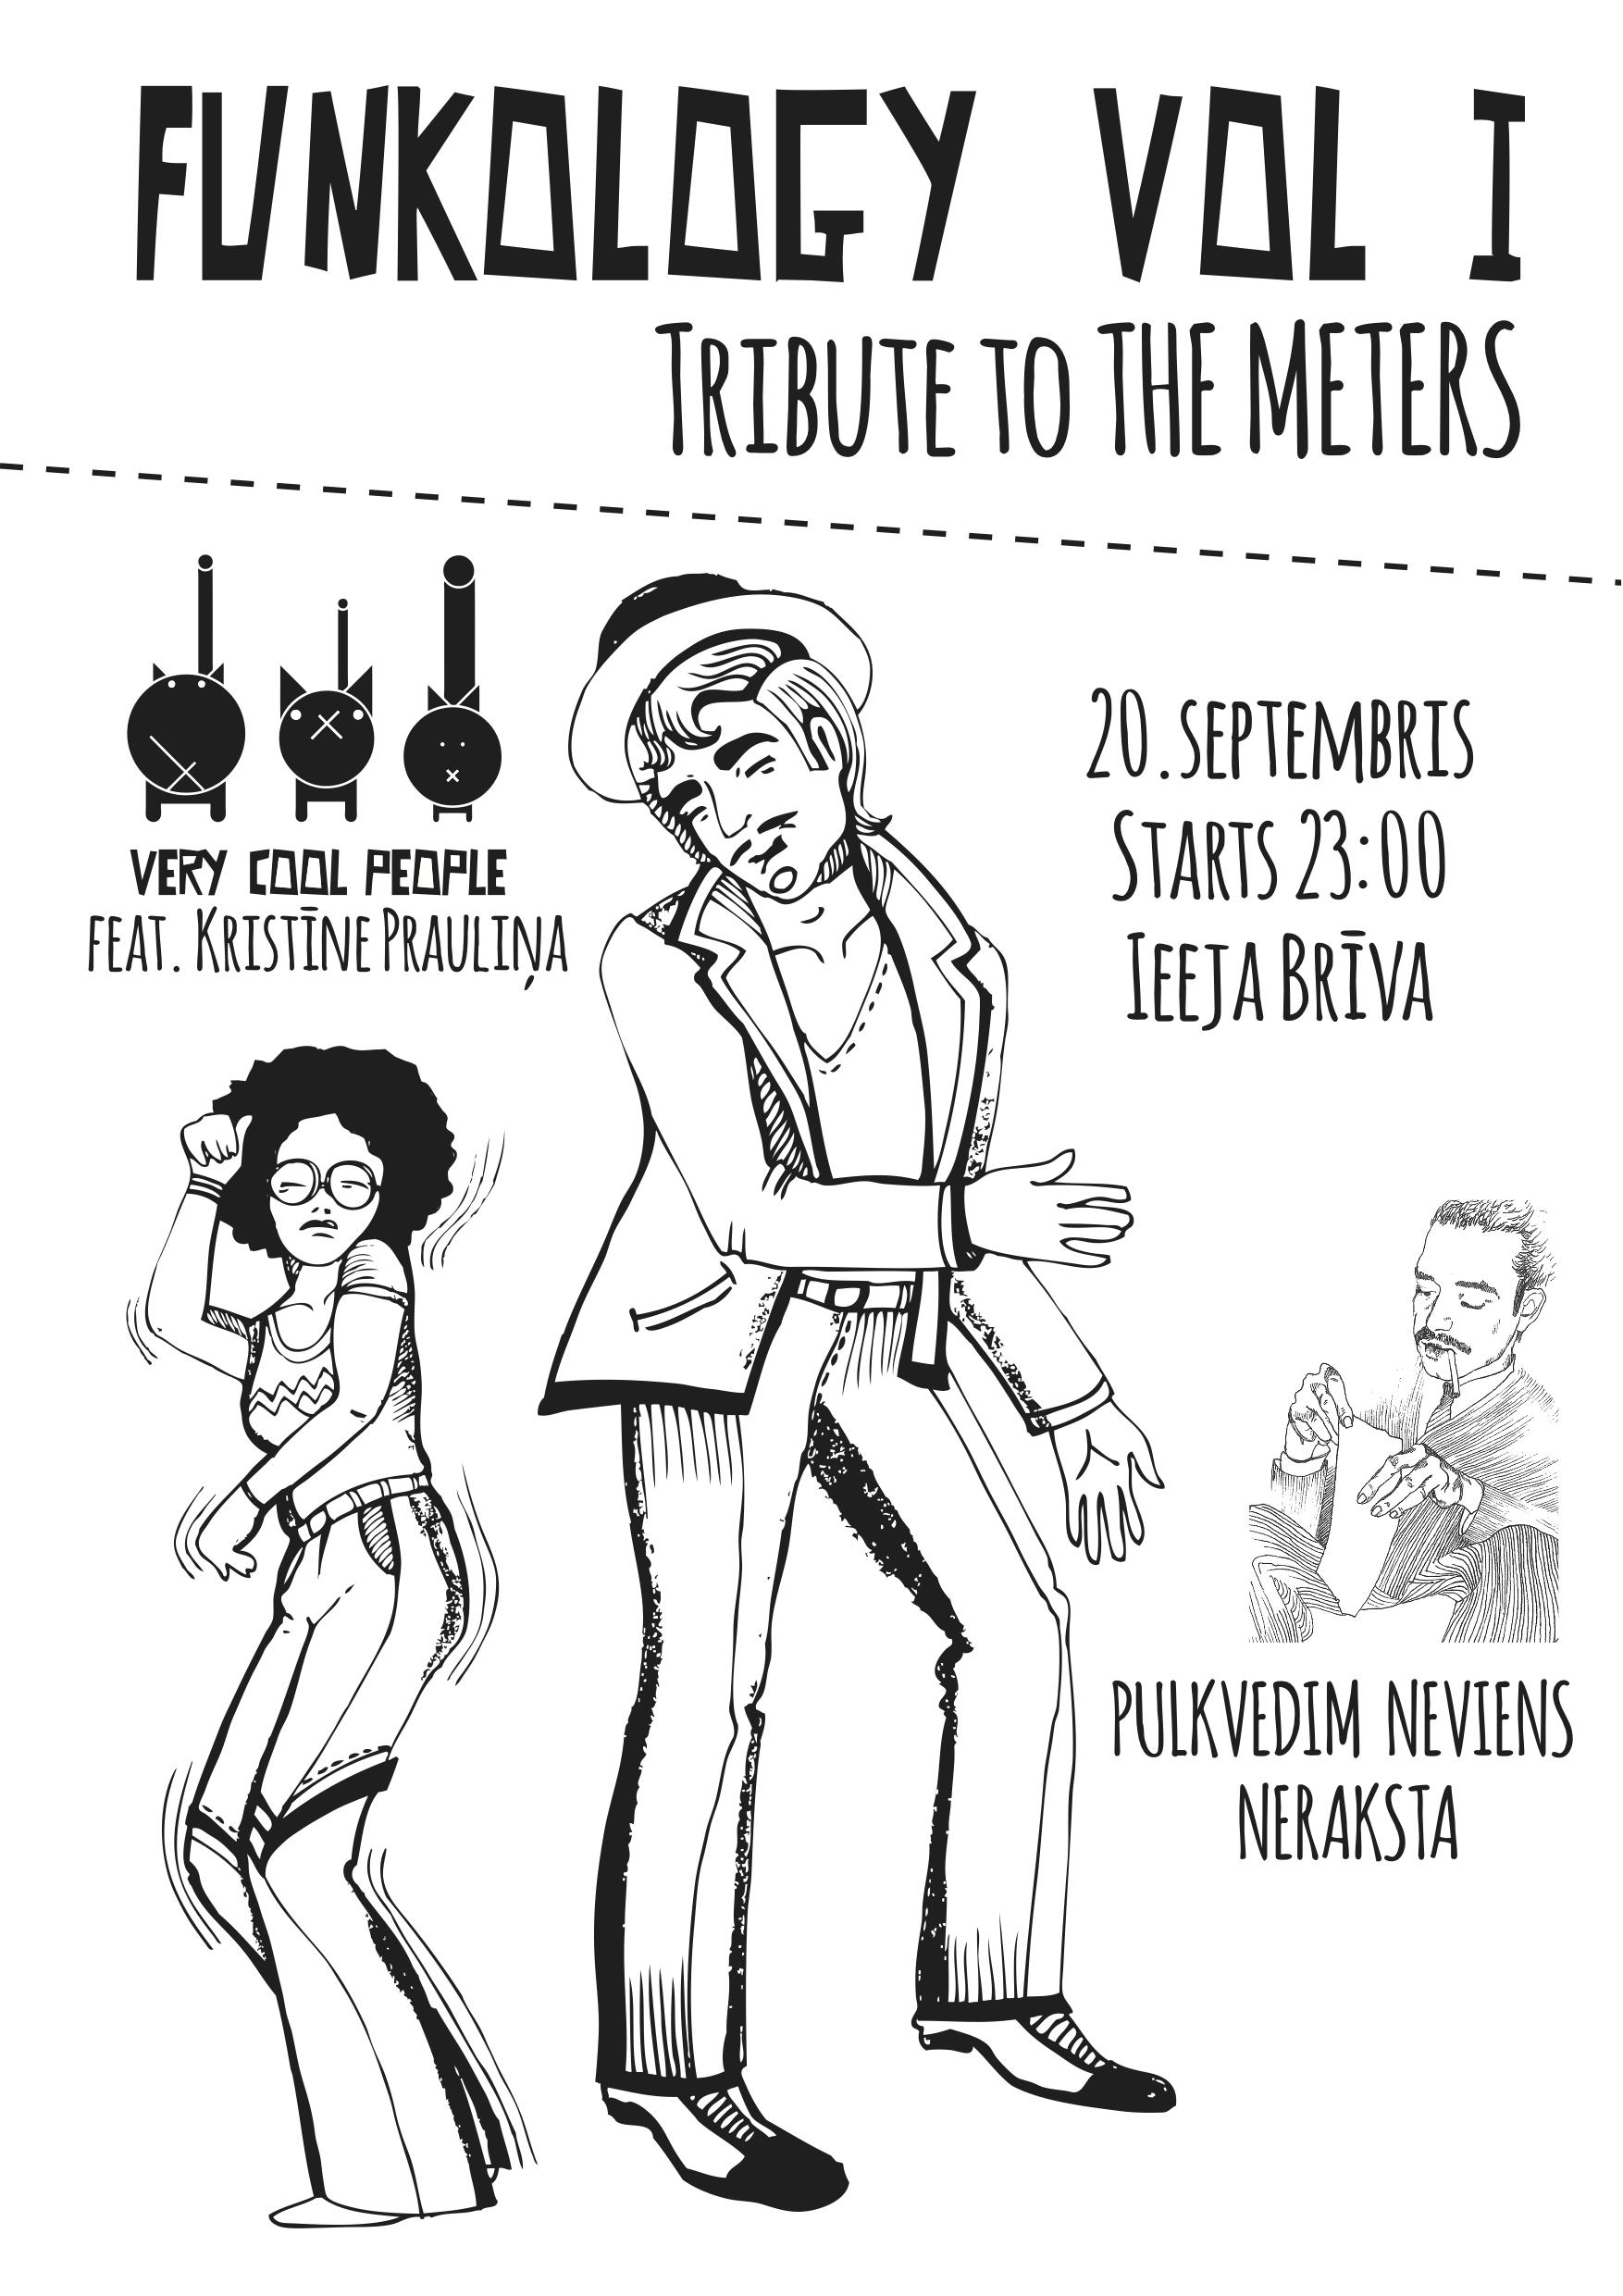 Funkology Vol.1 (tribute to The Meters) @ Pulkvedim Neviens Neraksta